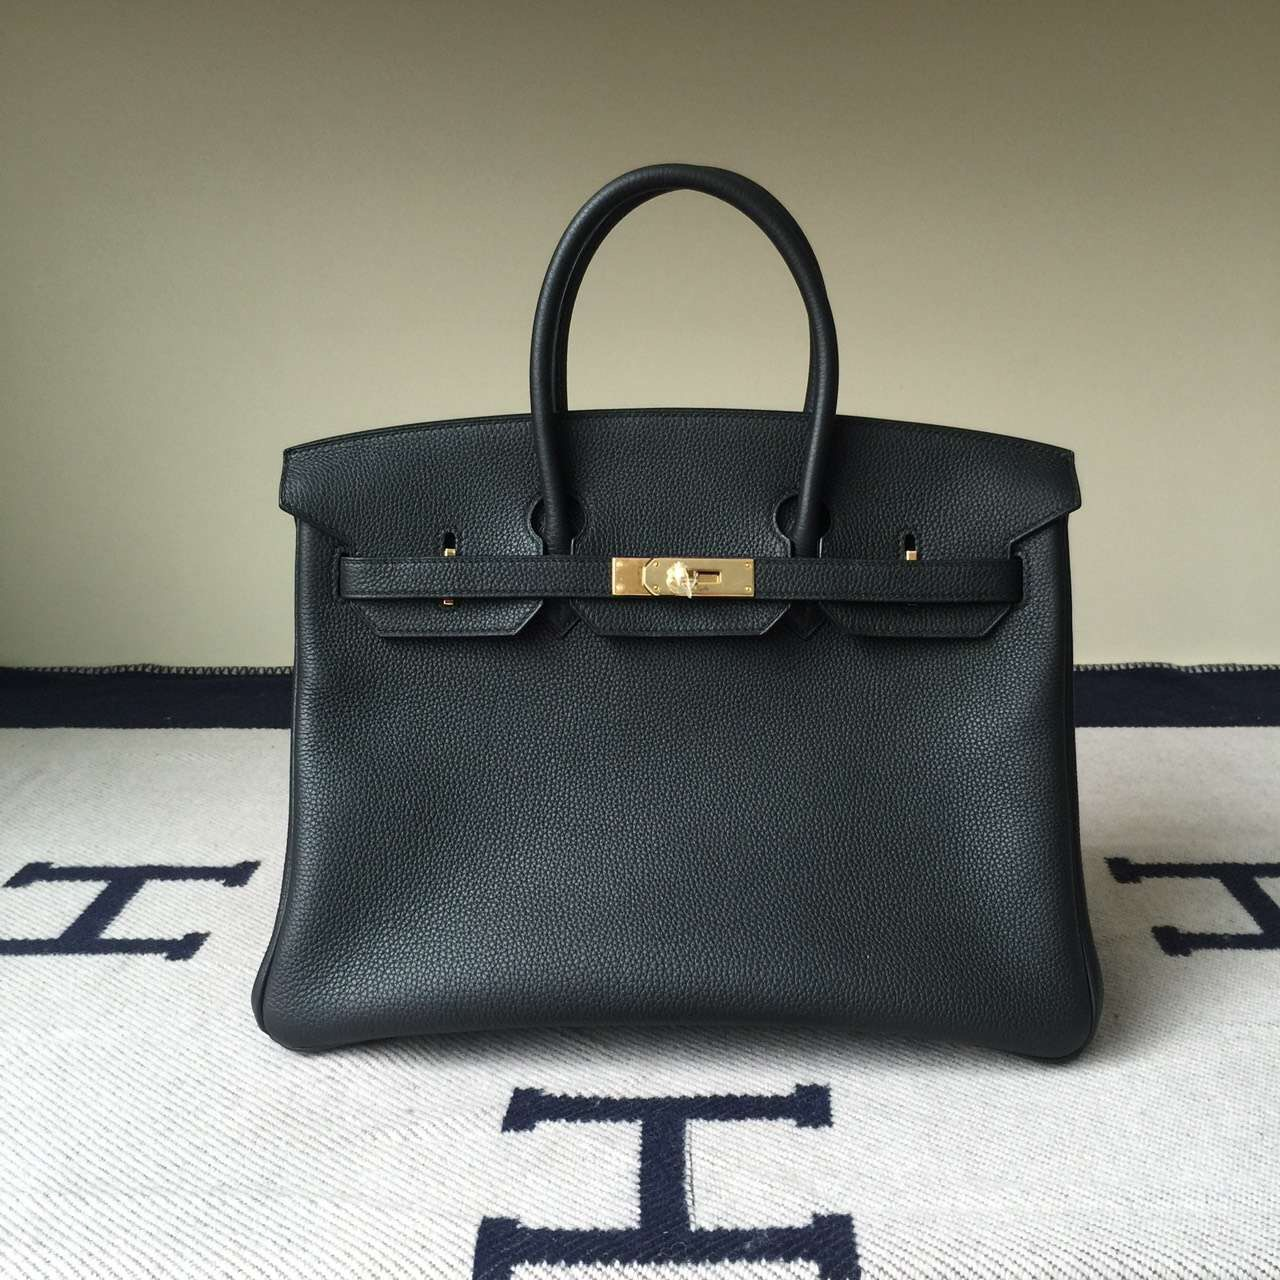 Hermes Classic Handbag Togo Calf  Leather Birkin35cm in CK89 Black